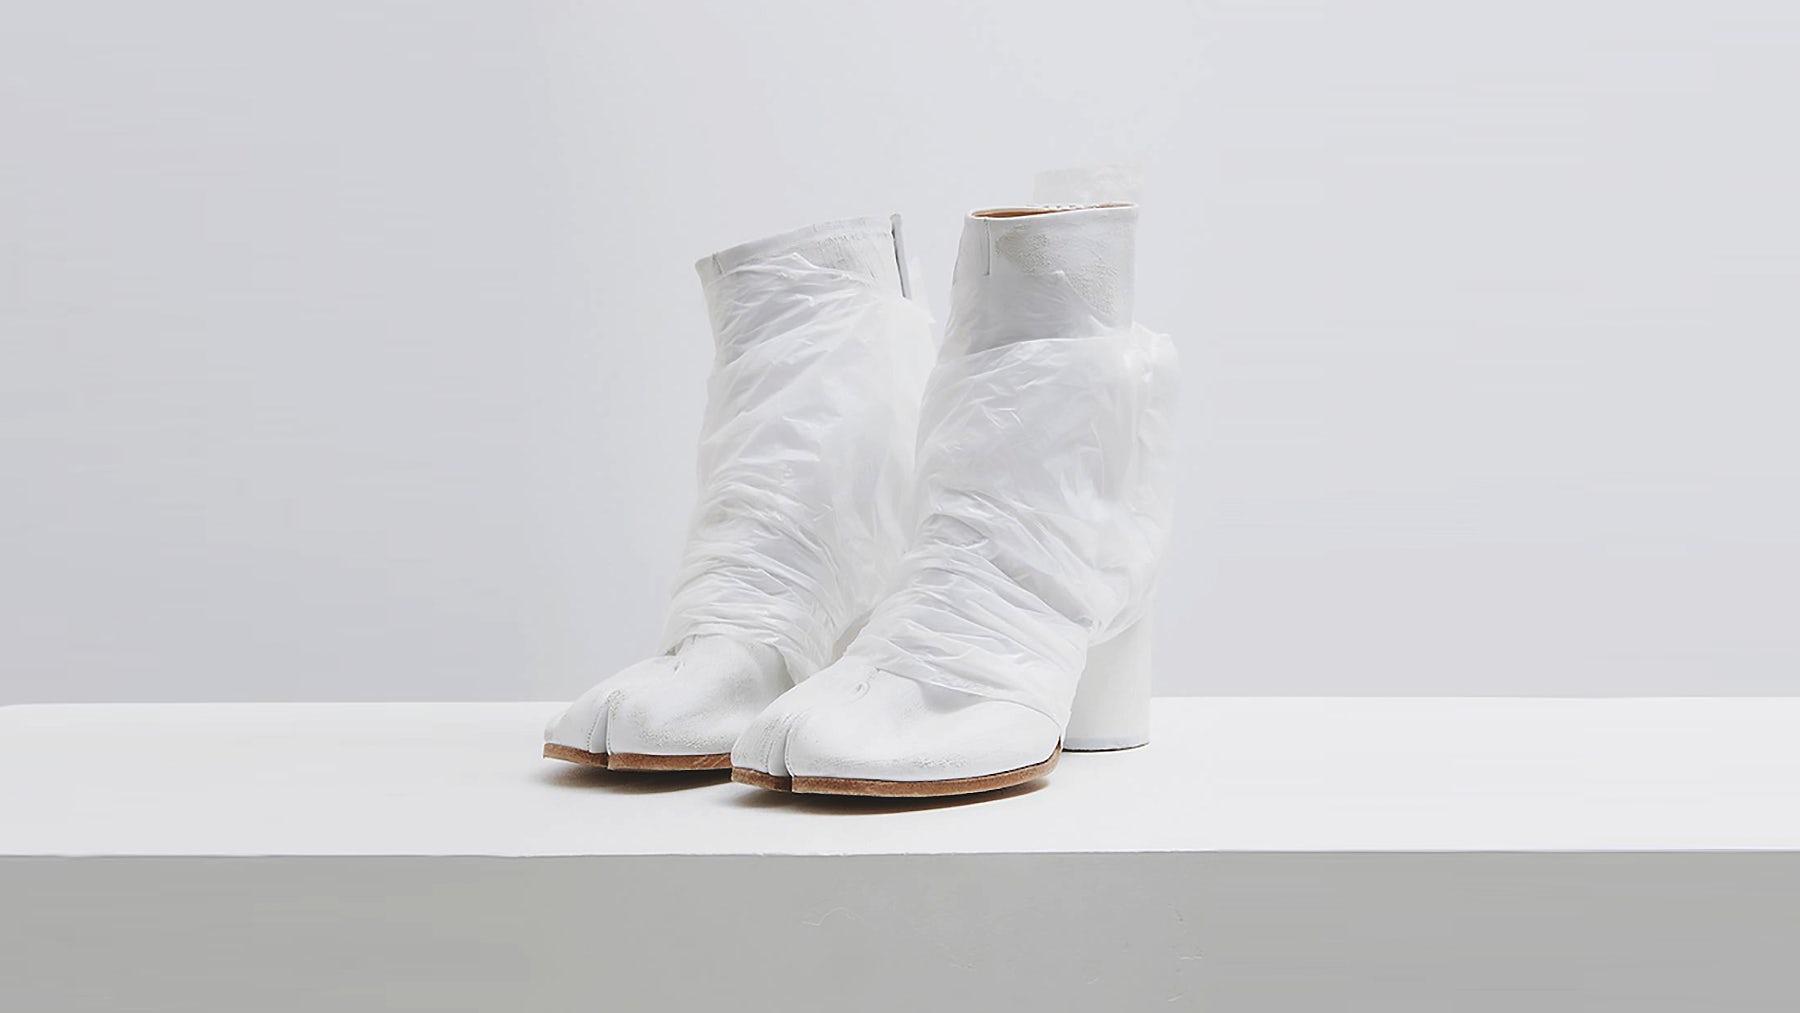 Margiela's Tabi shoes | Source: Instagram @MaisonMargiela